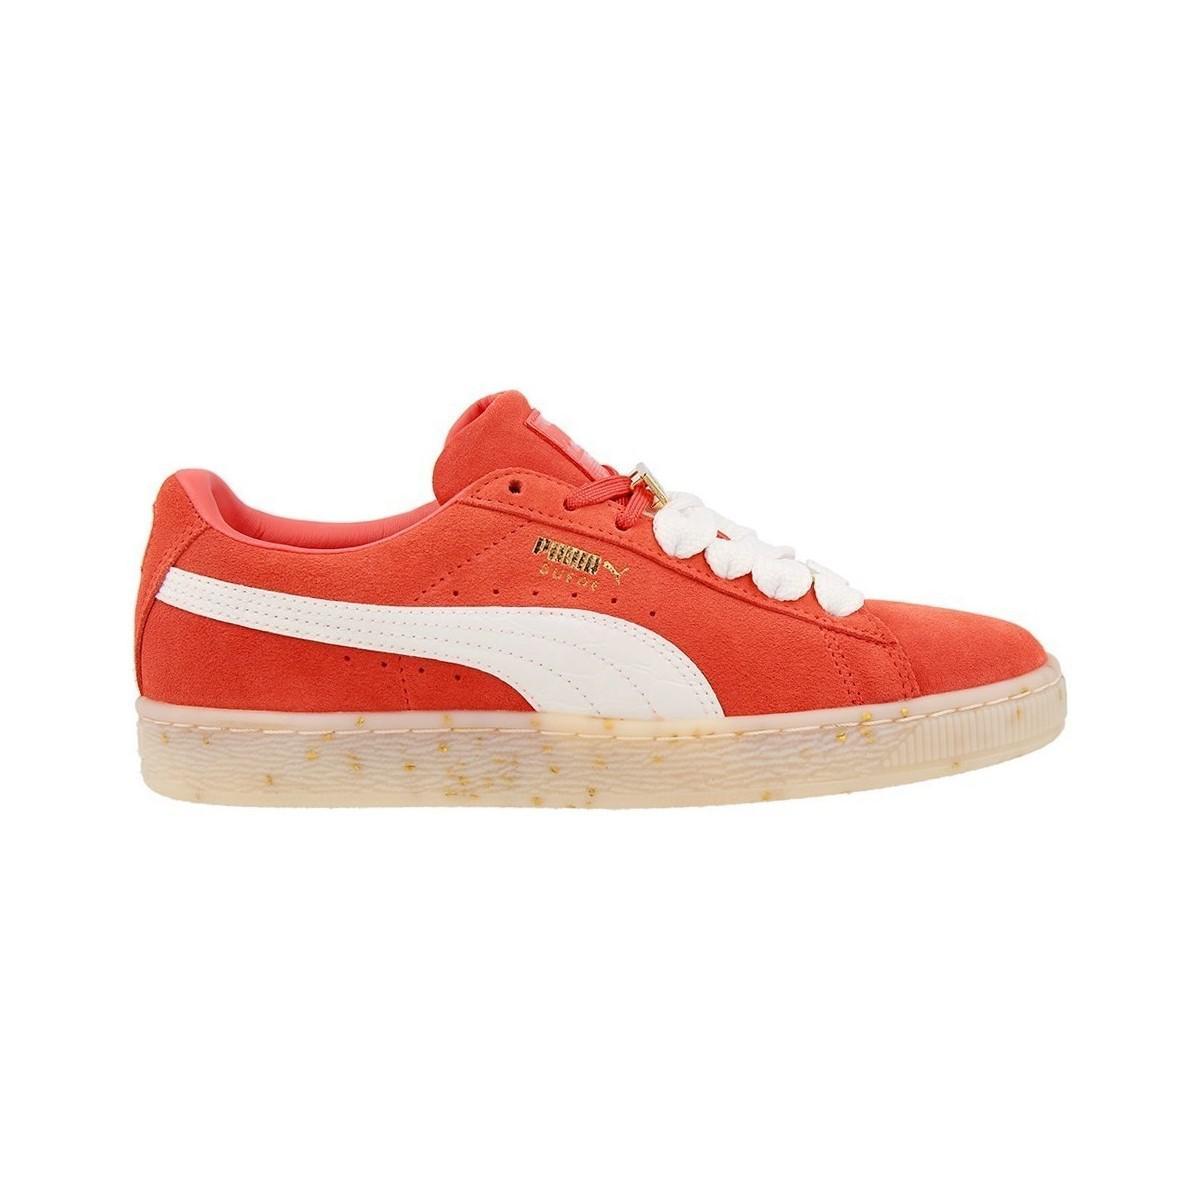 9e457f0b001e Puma suede classic bboy fab spiced womens shoes trainers jpg 1200x1200 Puma  bboy